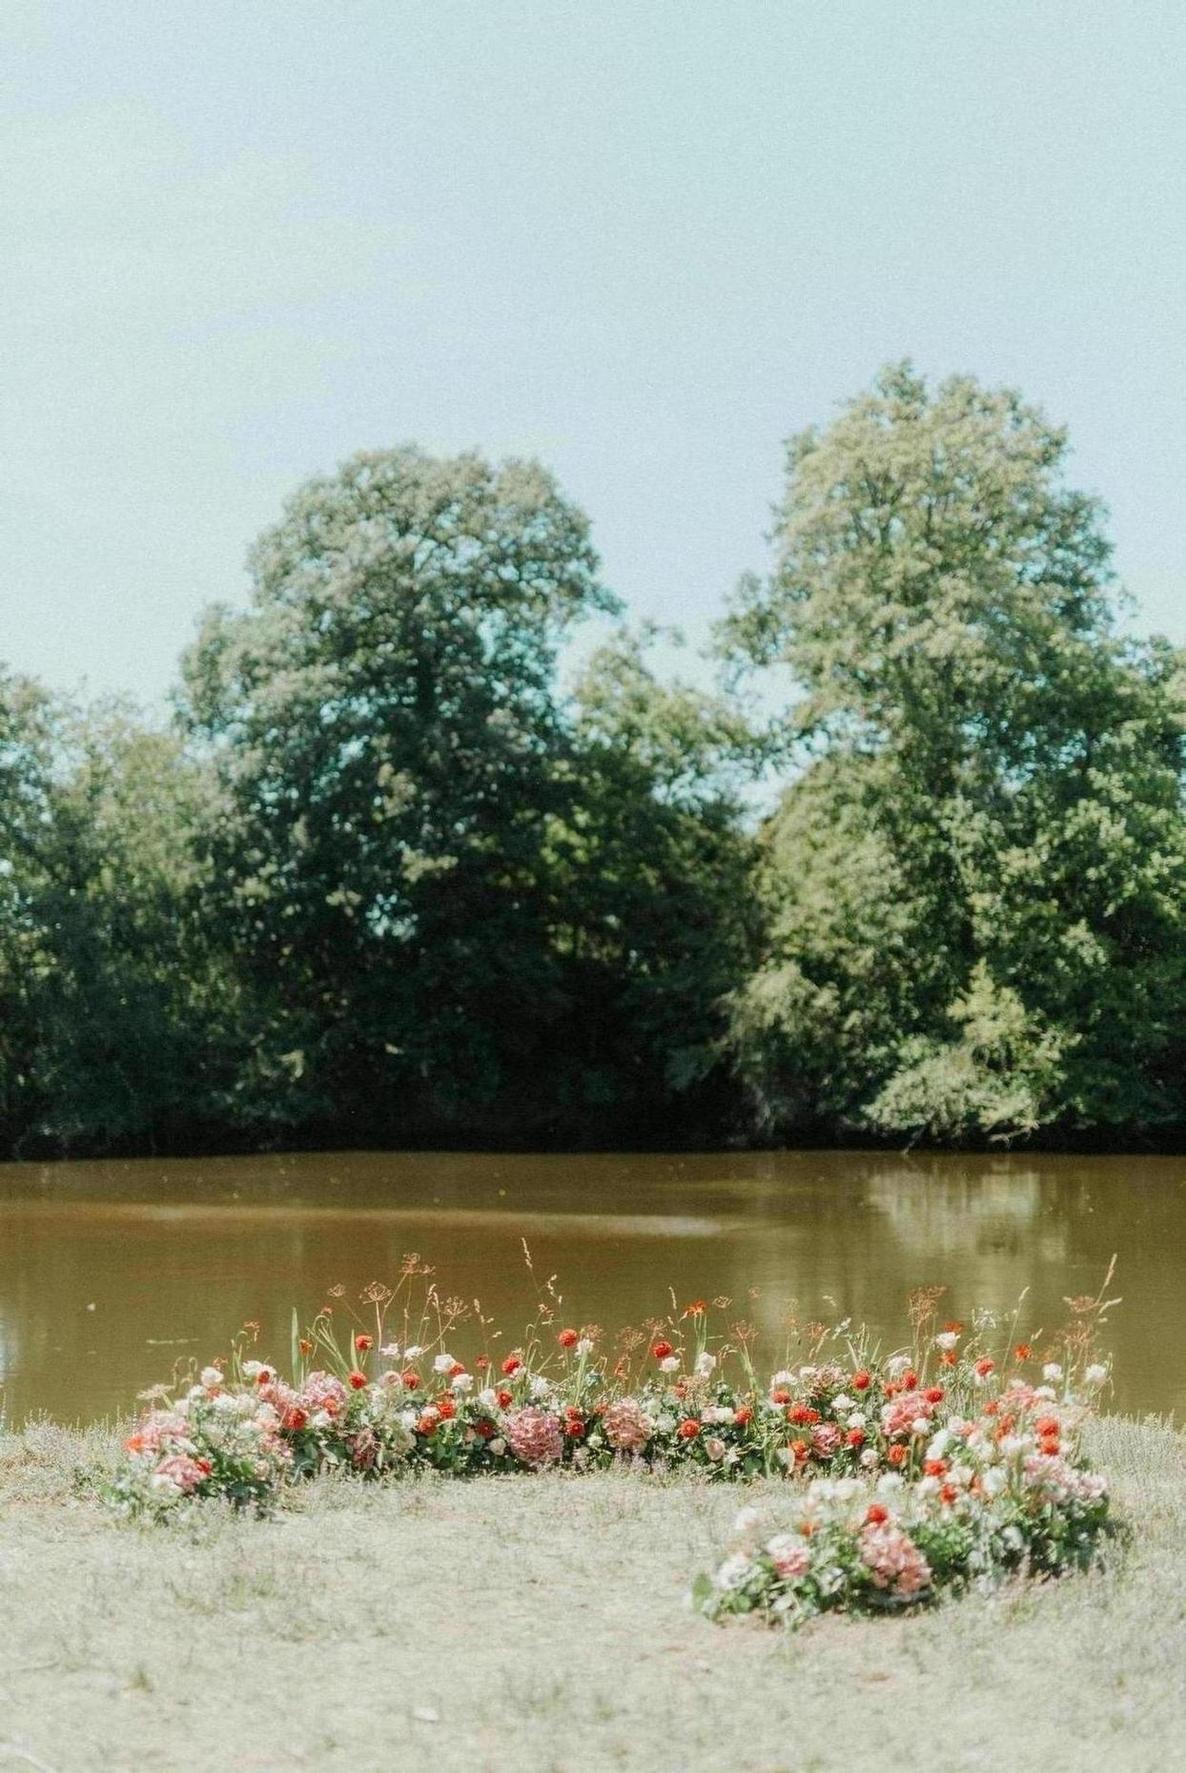 ceremonie laique mariage nantes angers chateaubriand